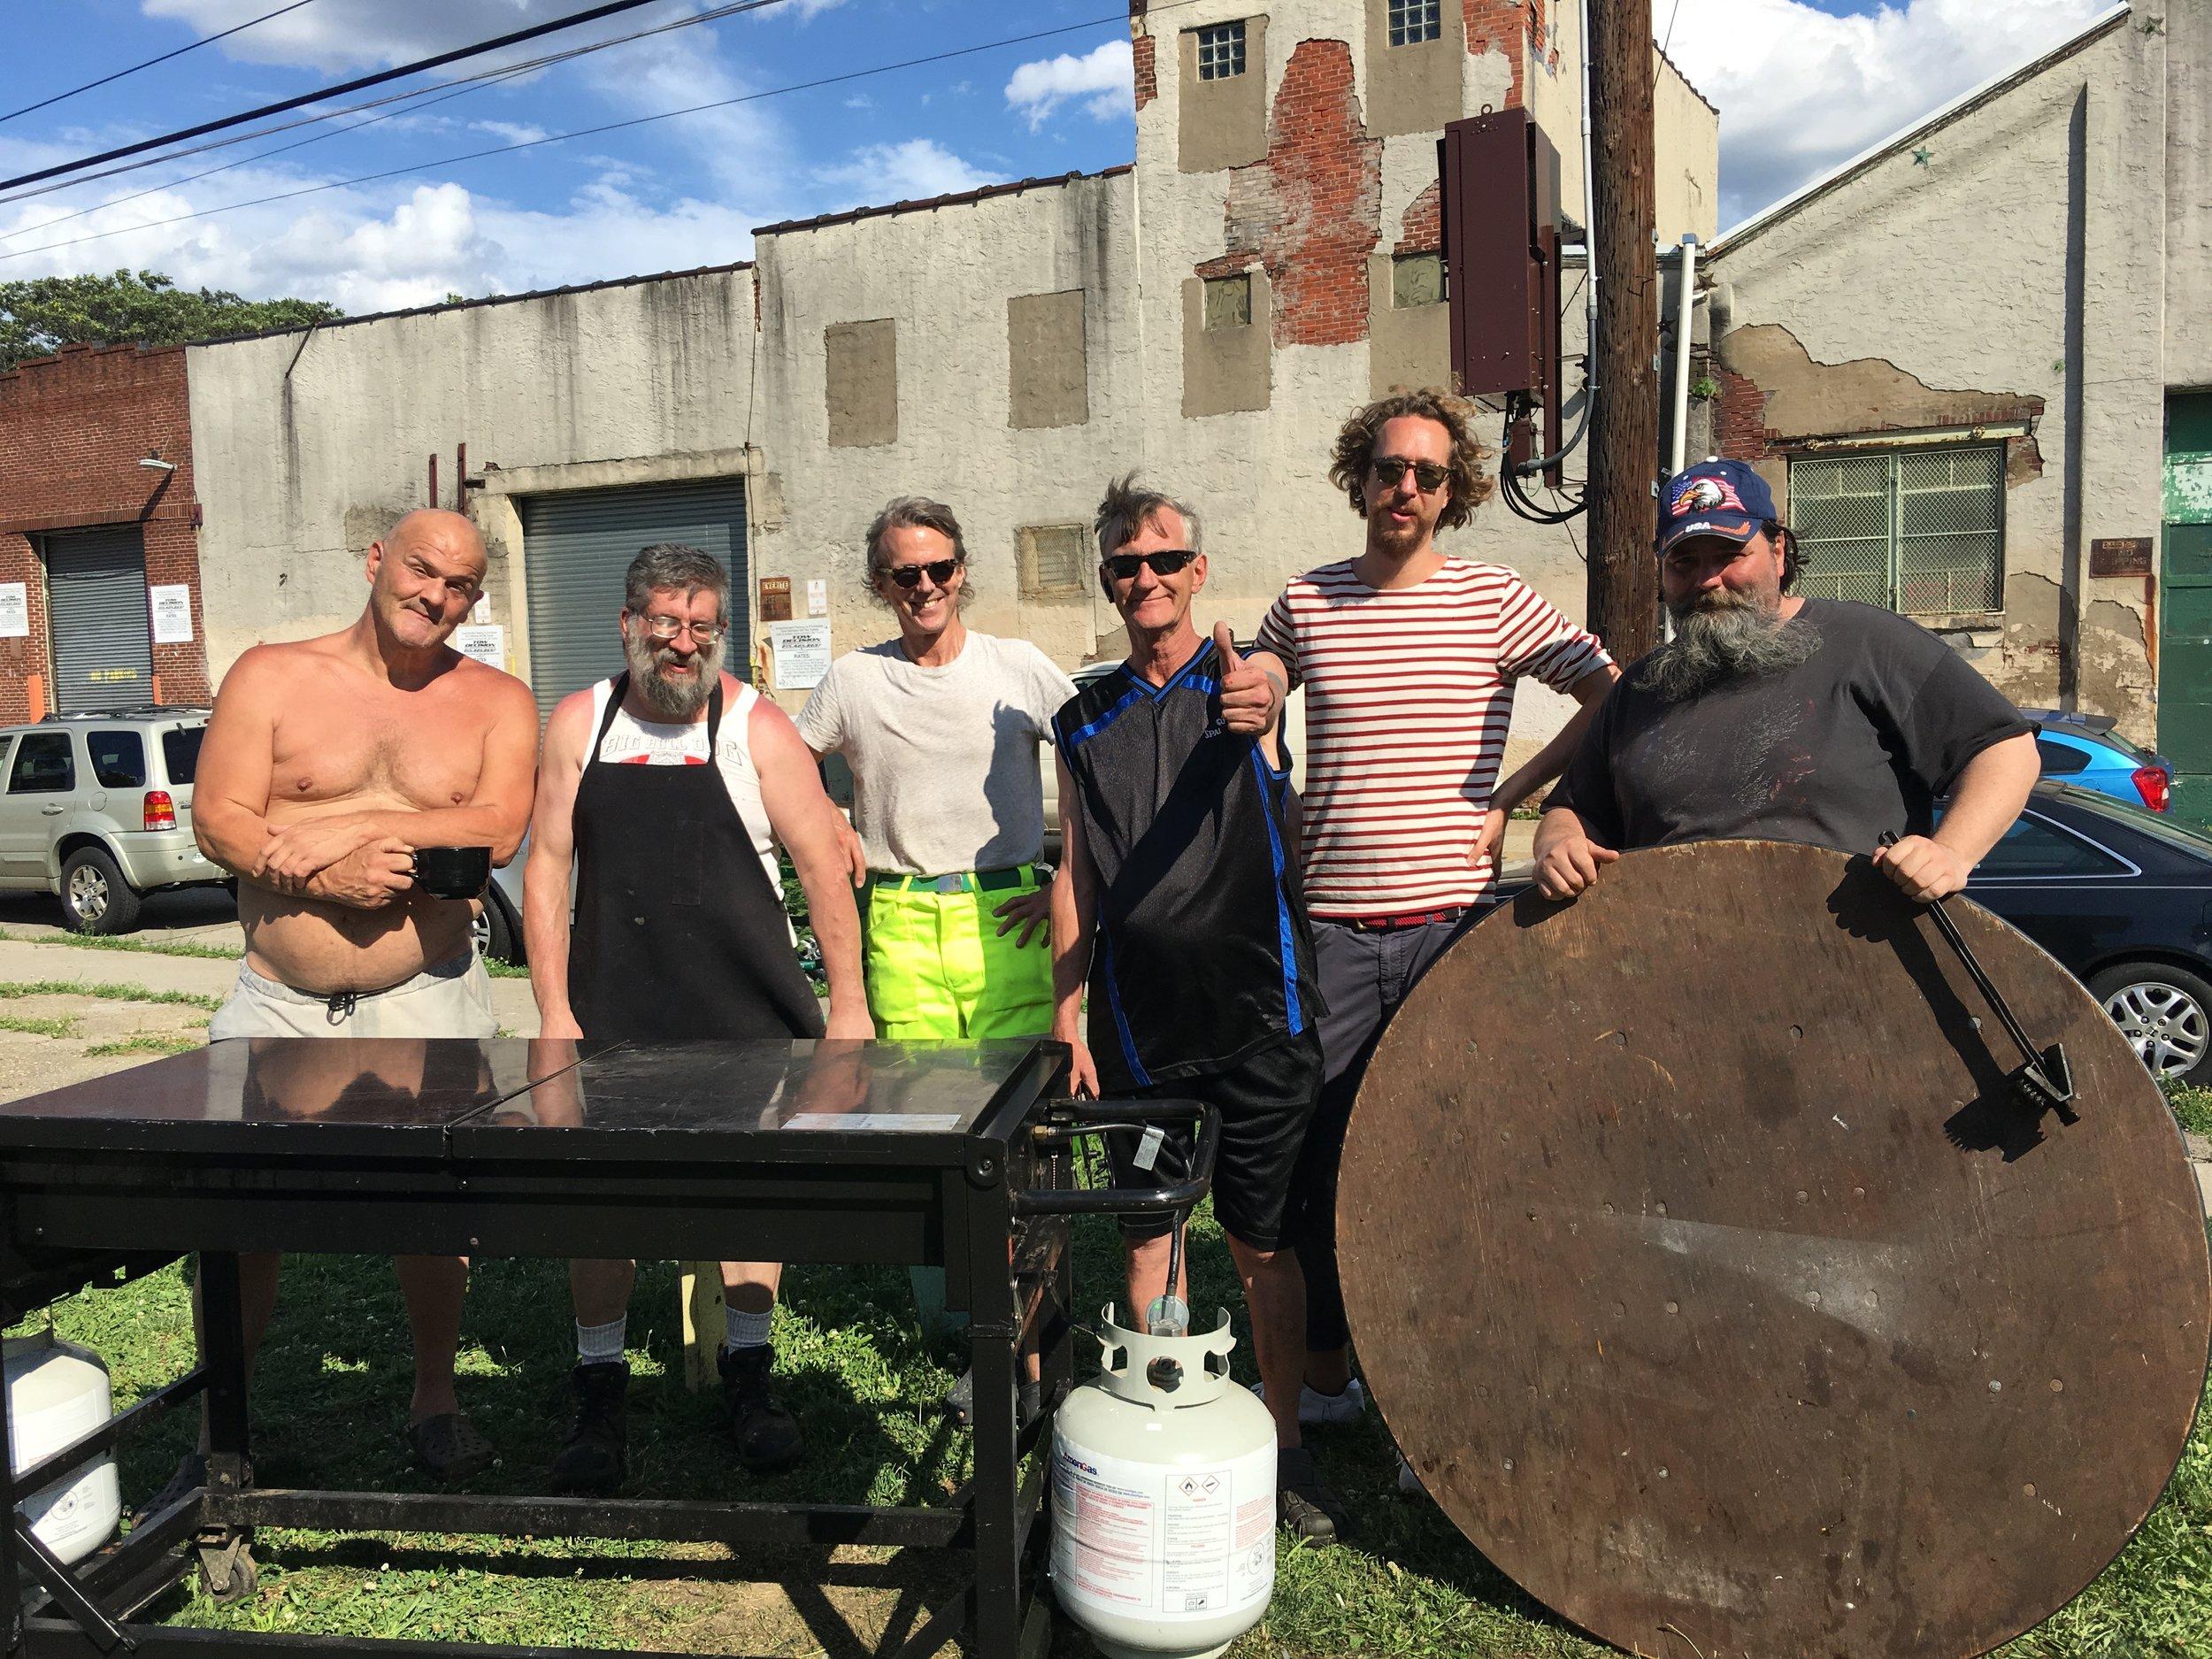 Friends of The Huntingdon Emerald Park enjoying a BBQ